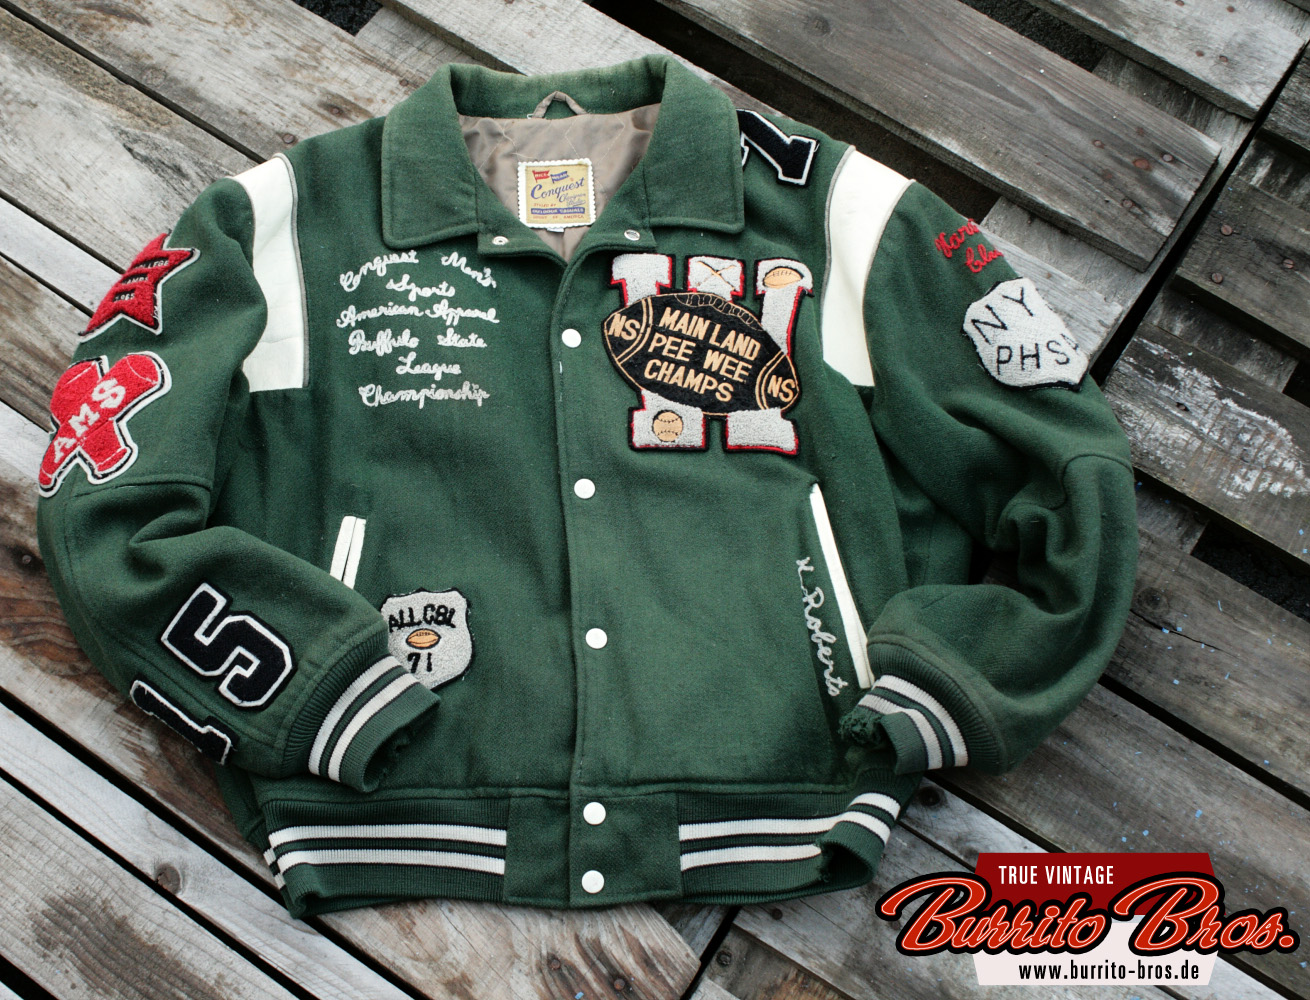 Letterman jacket by Chevignon